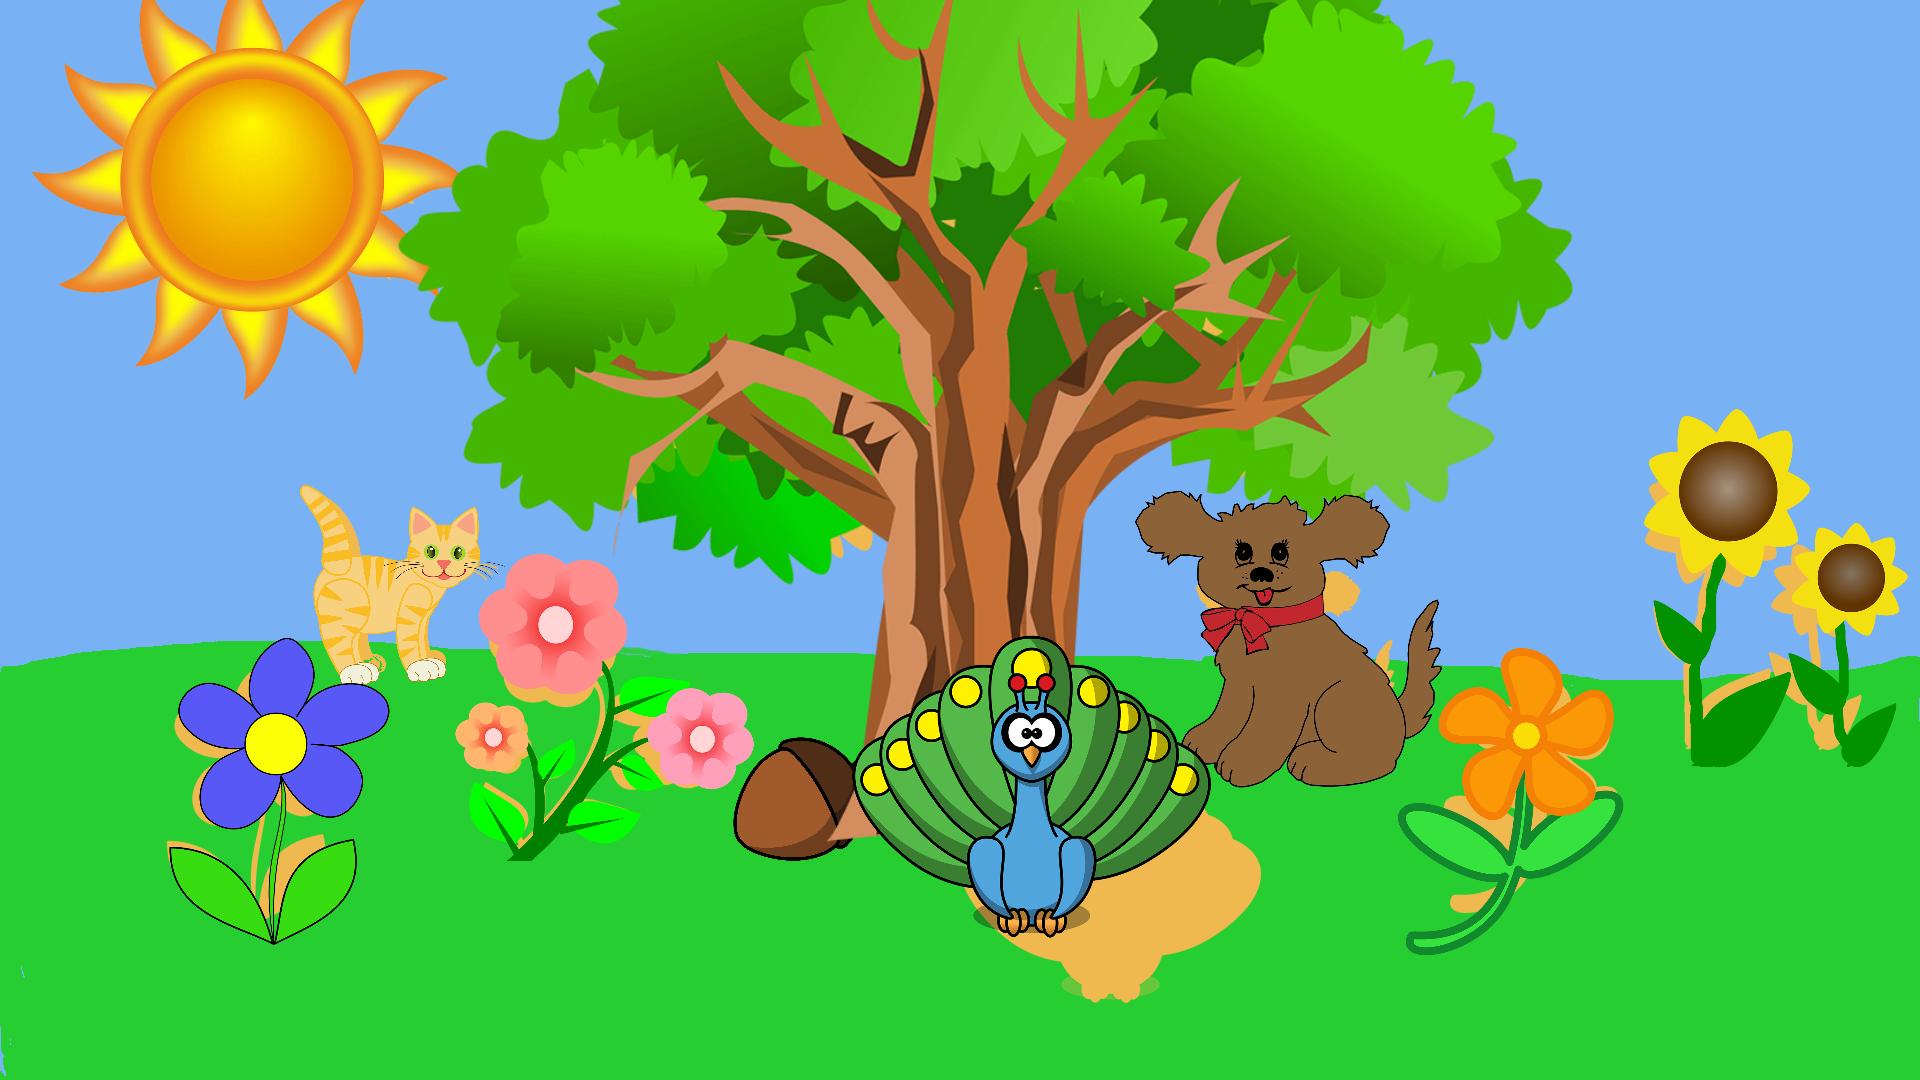 Kids Paint In Progress Sticker Page screenshot.png